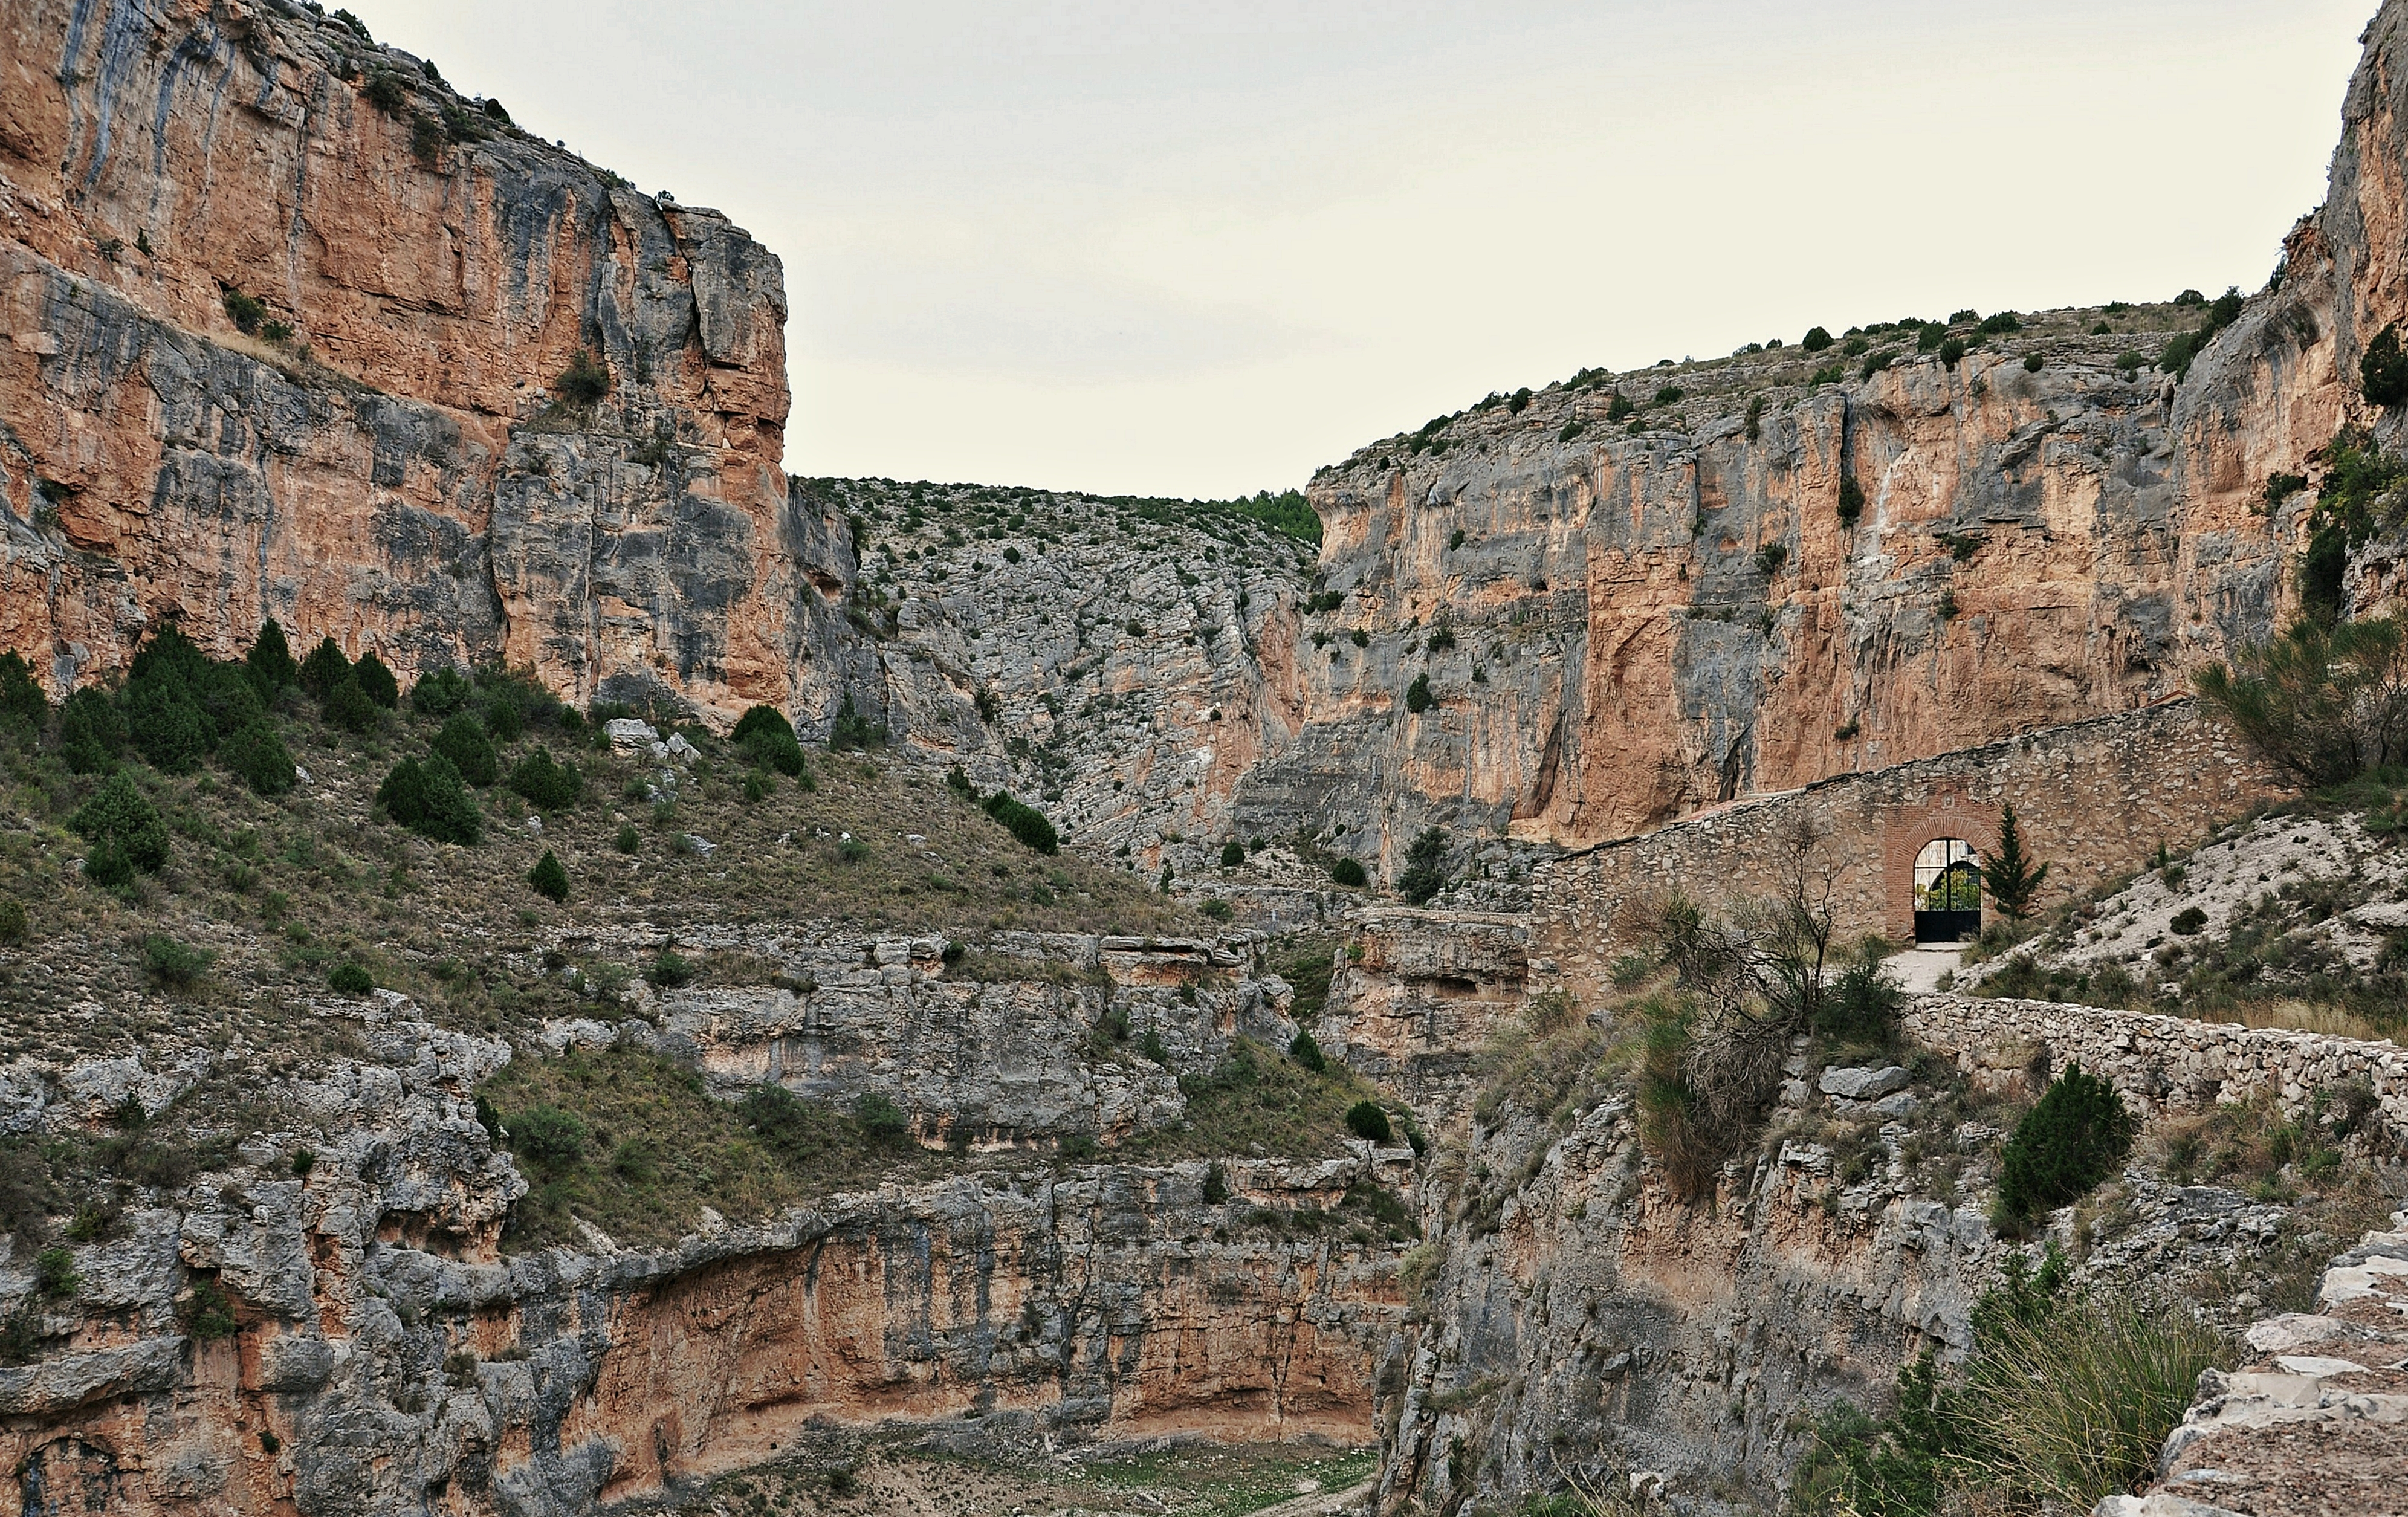 File:Antiguo corral-jaraba-